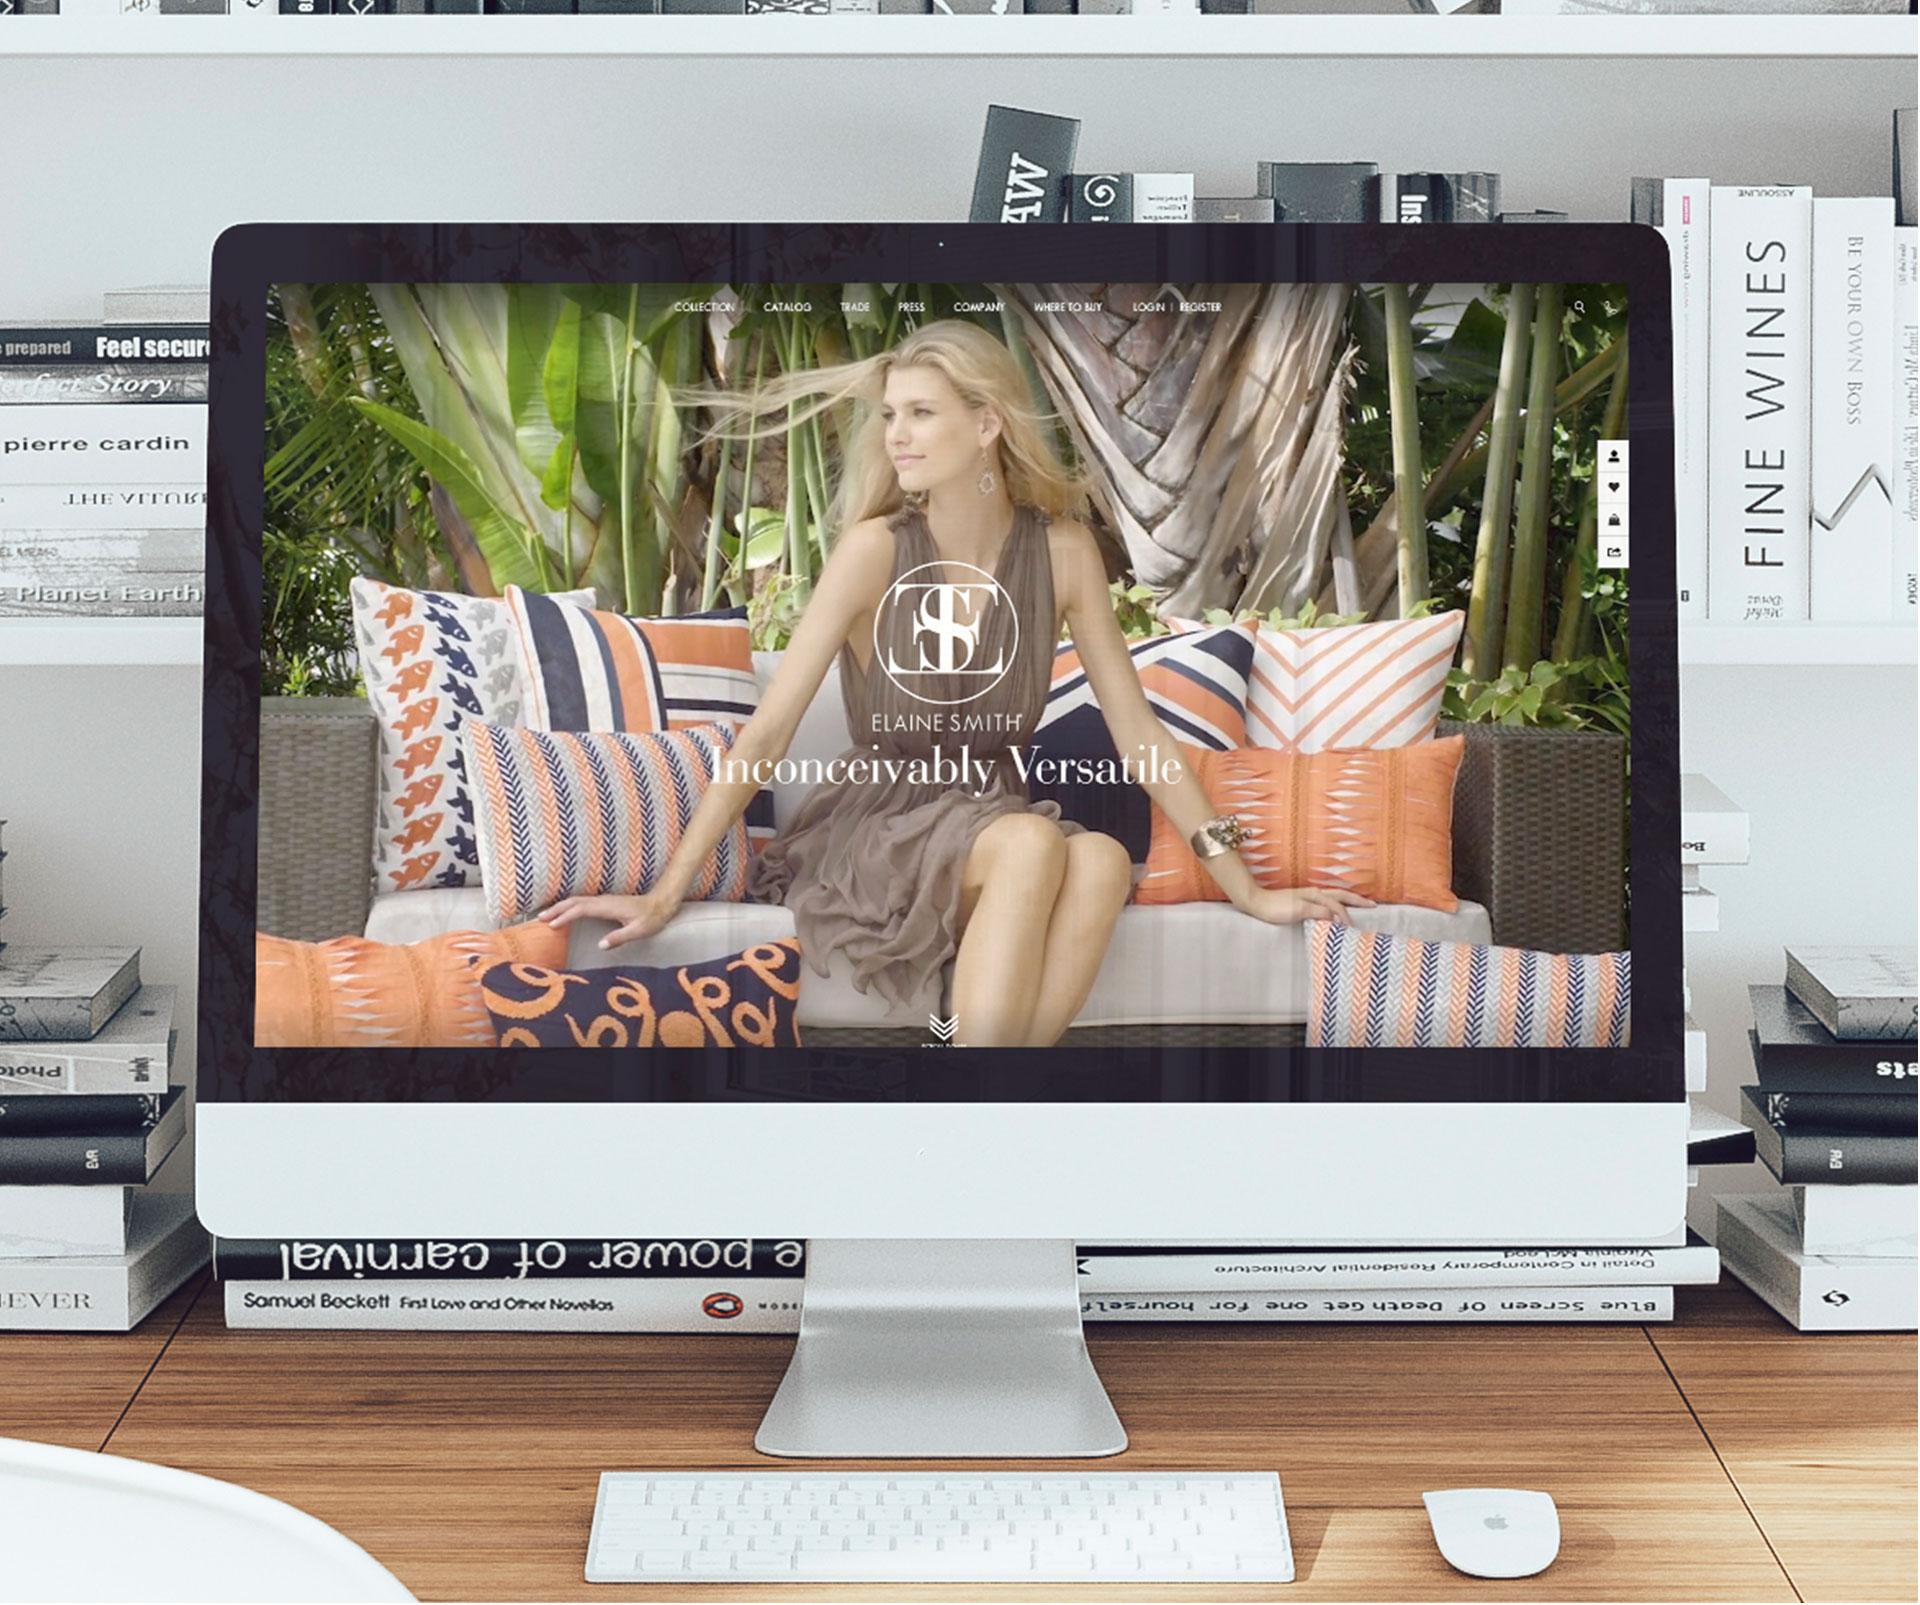 Jola_ourservices_assets_eCommerce---elainesmith---lifestyle